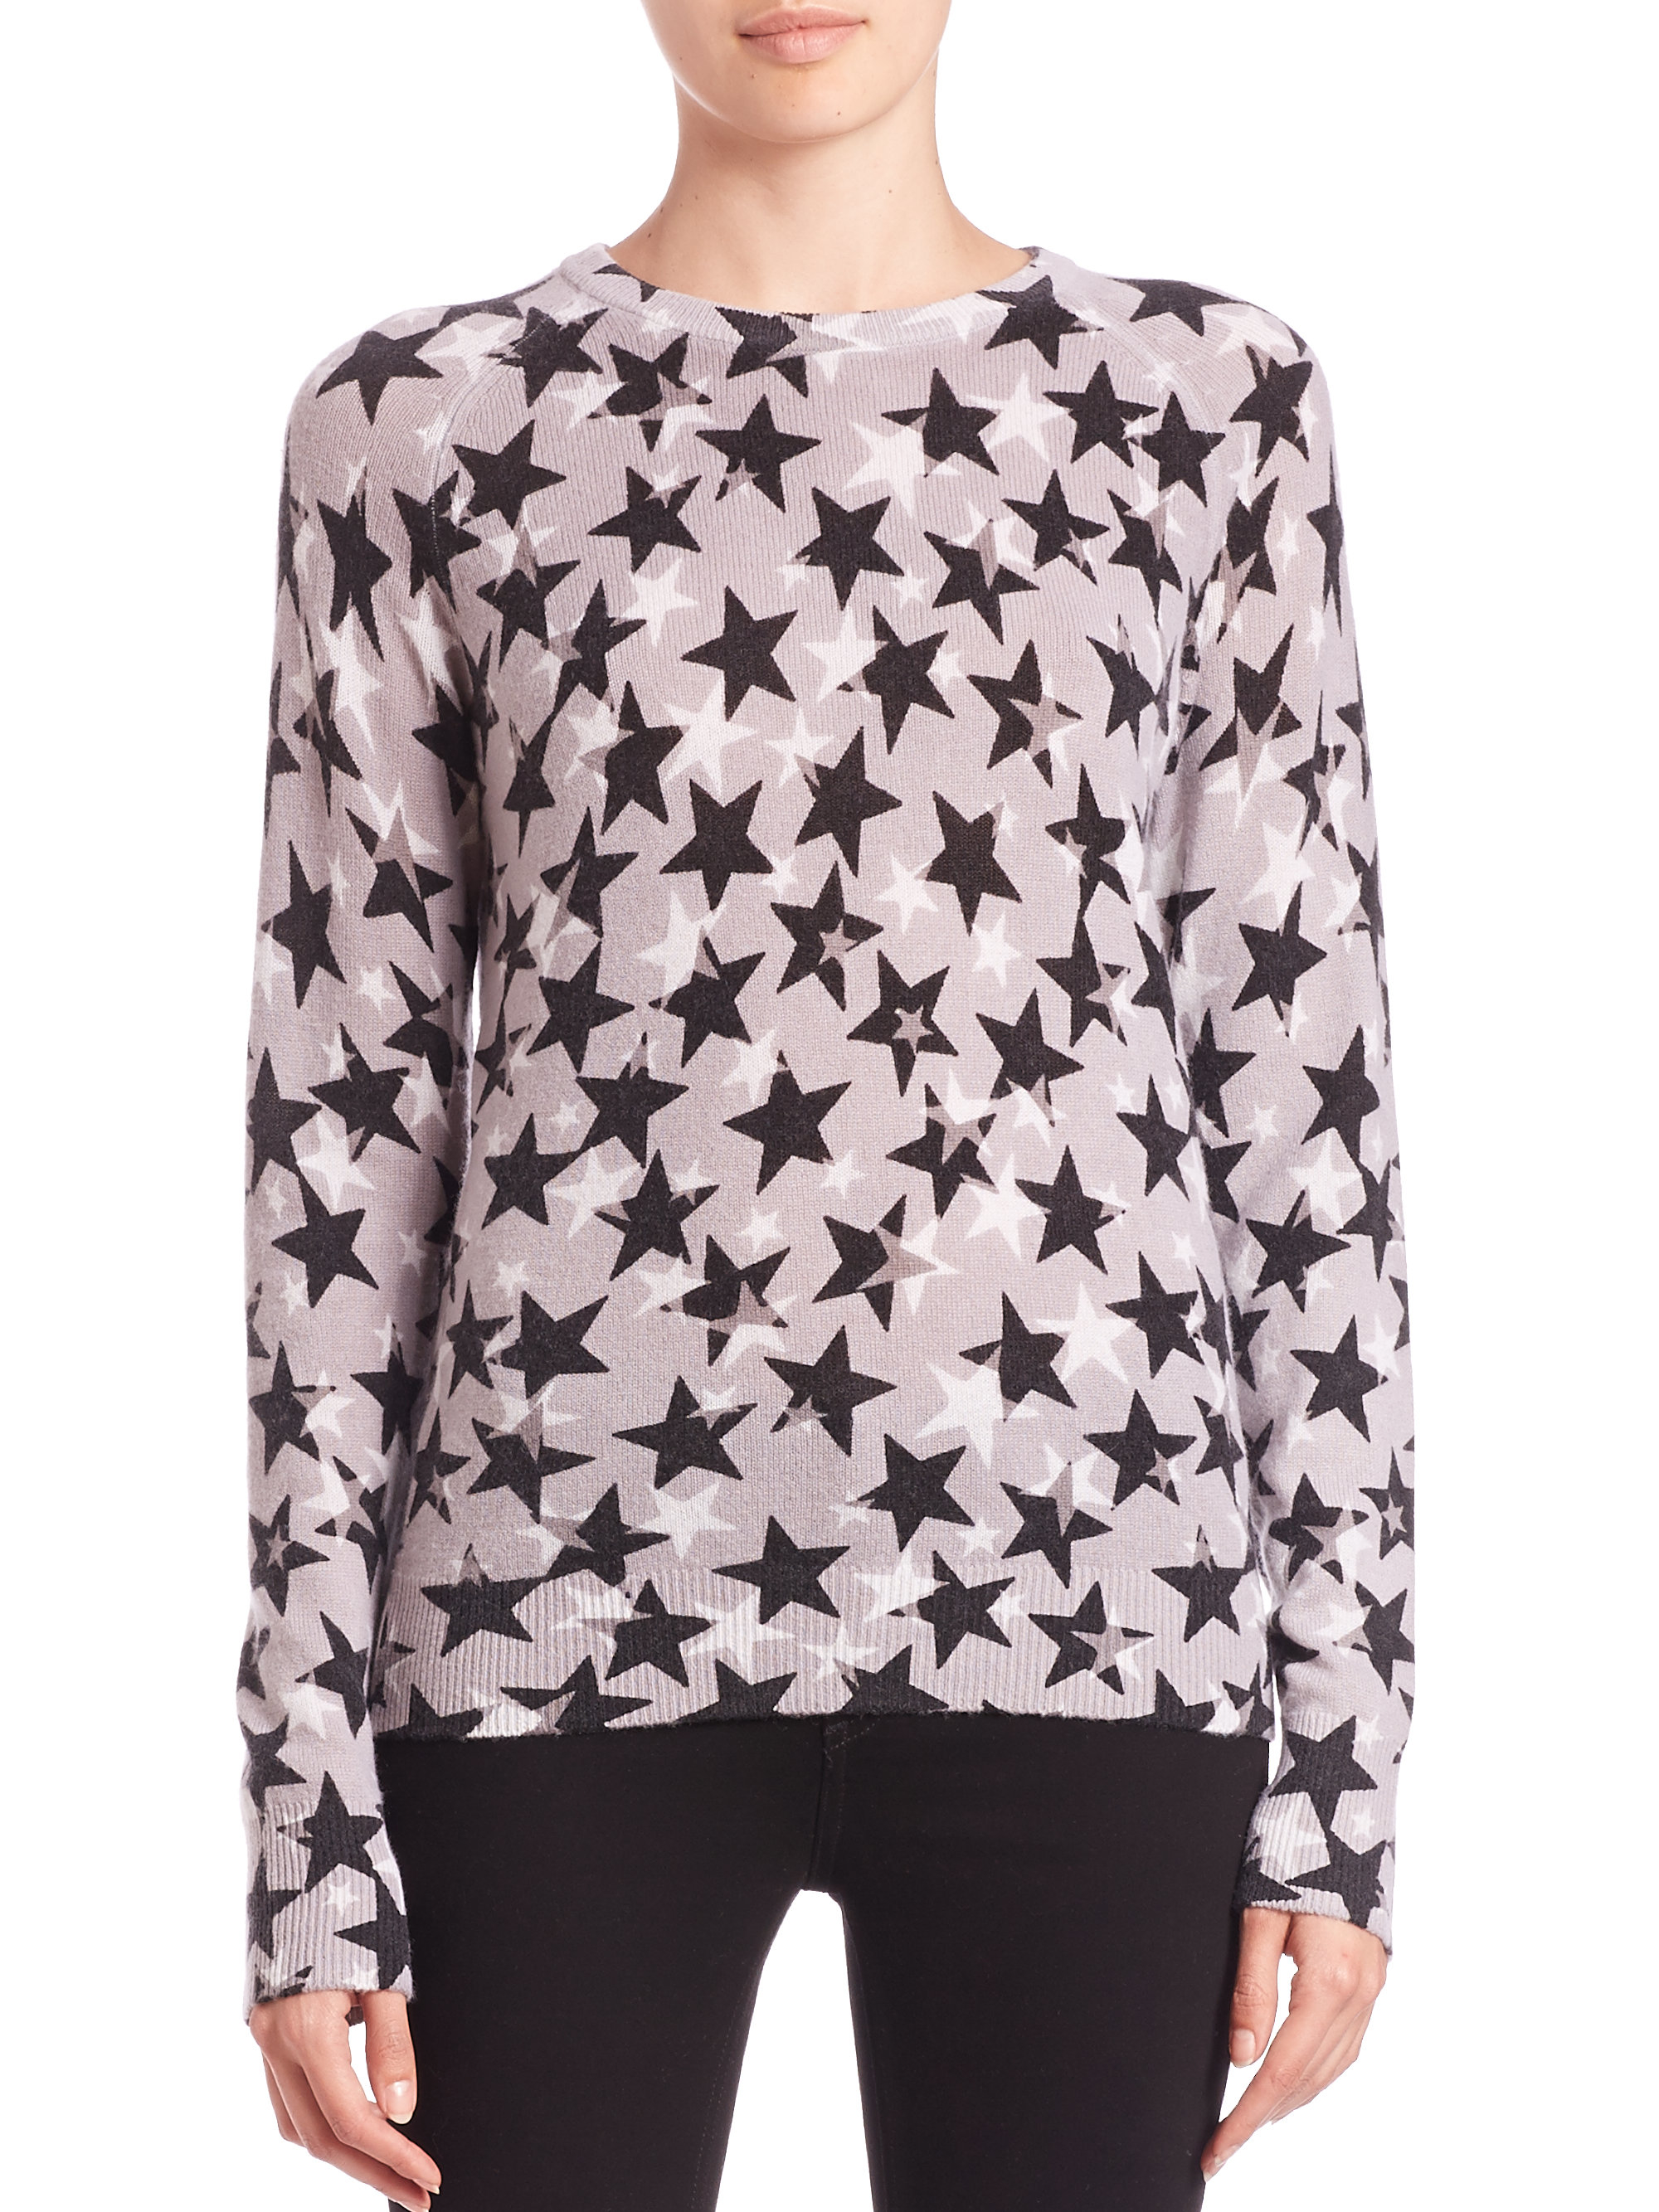 Equipment Sloane Star-print Cashmere Sweater | Lyst